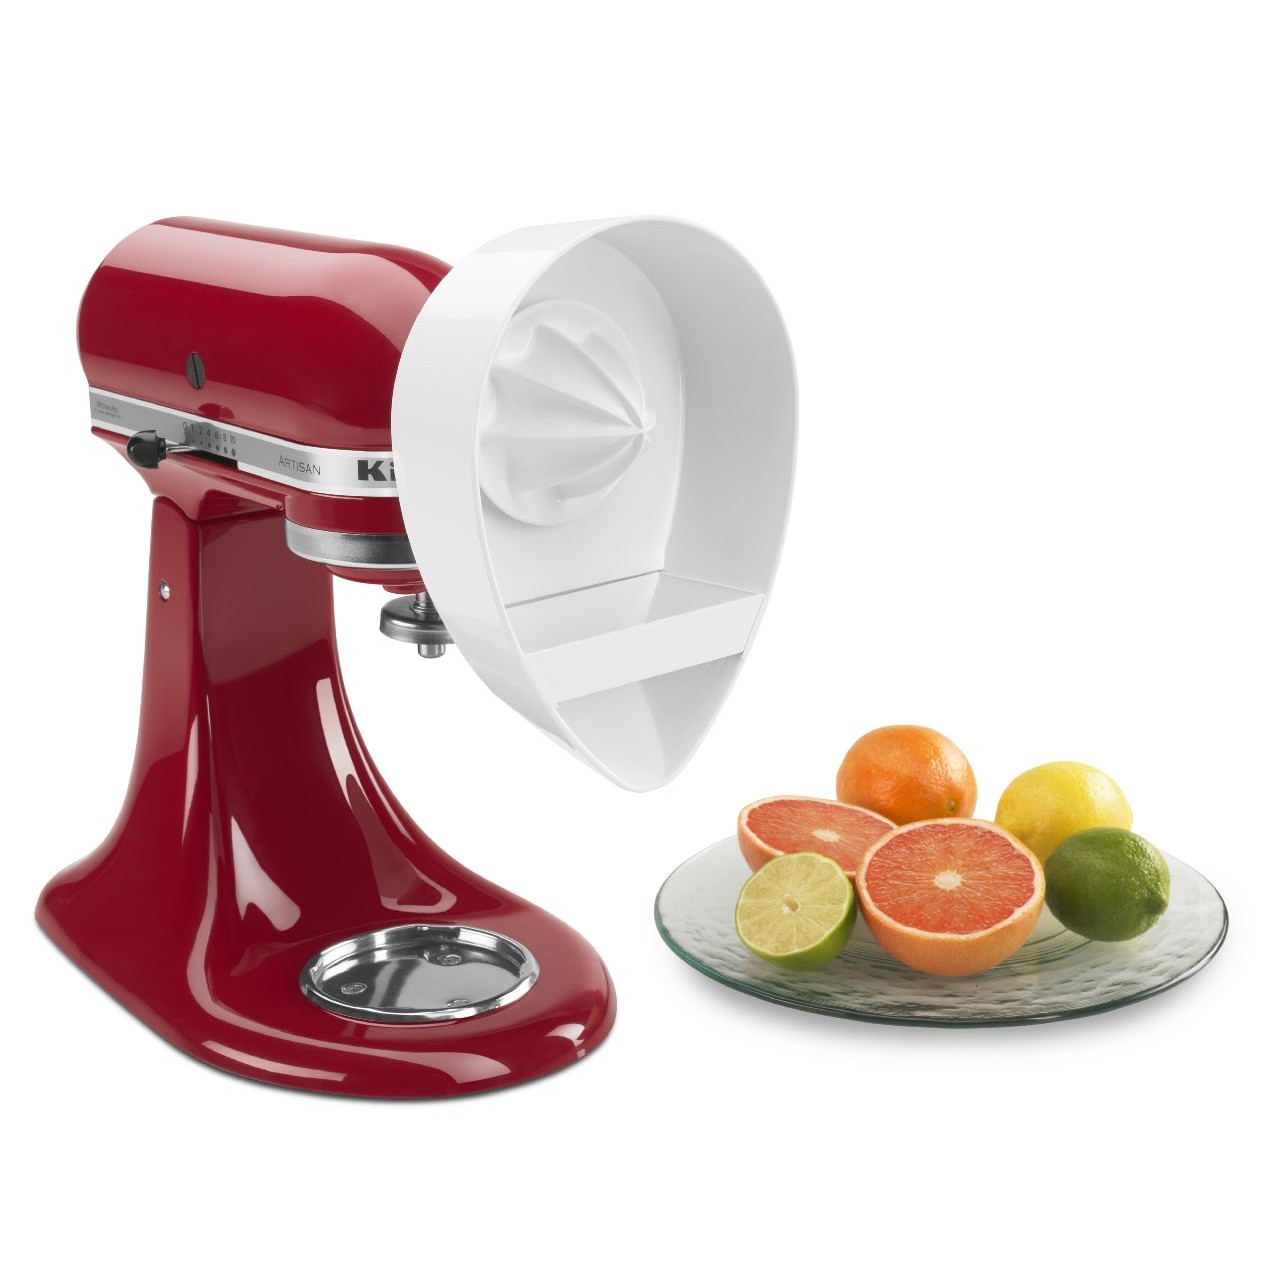 Kitchen aid mixer accesories Photo - 6